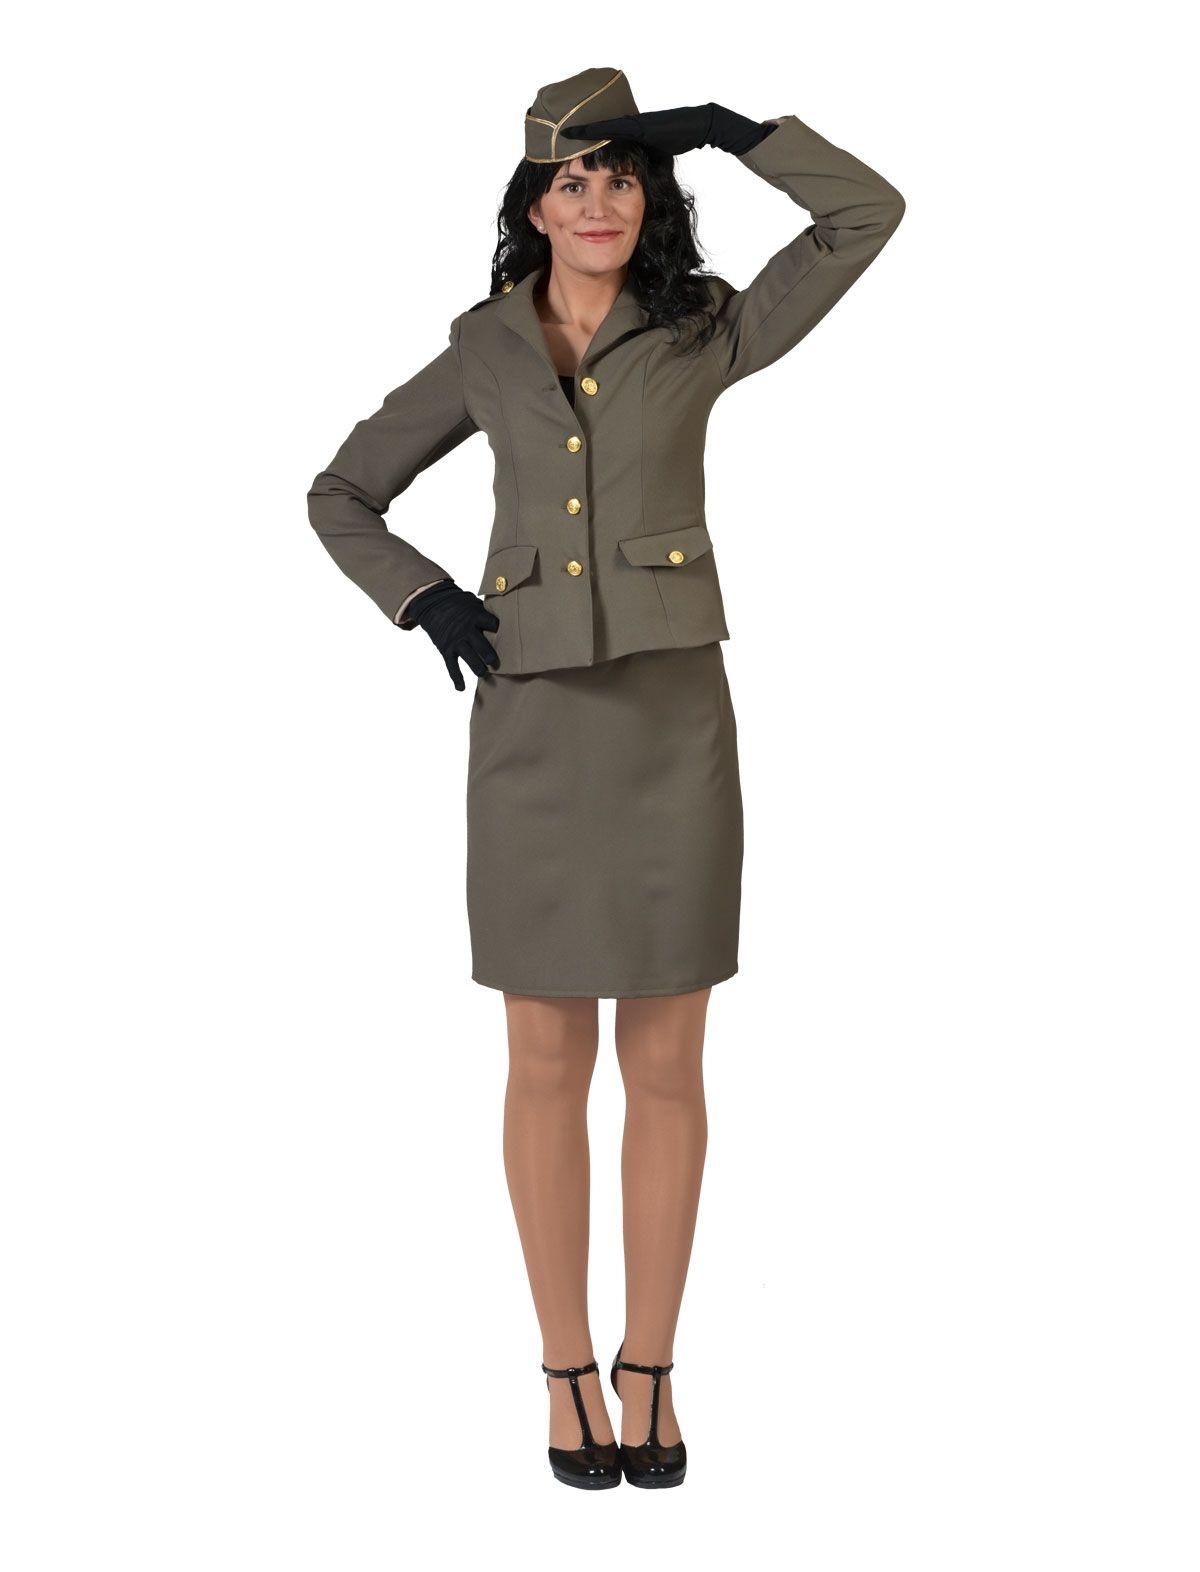 Legervrouw Kostuum | Militair Woman